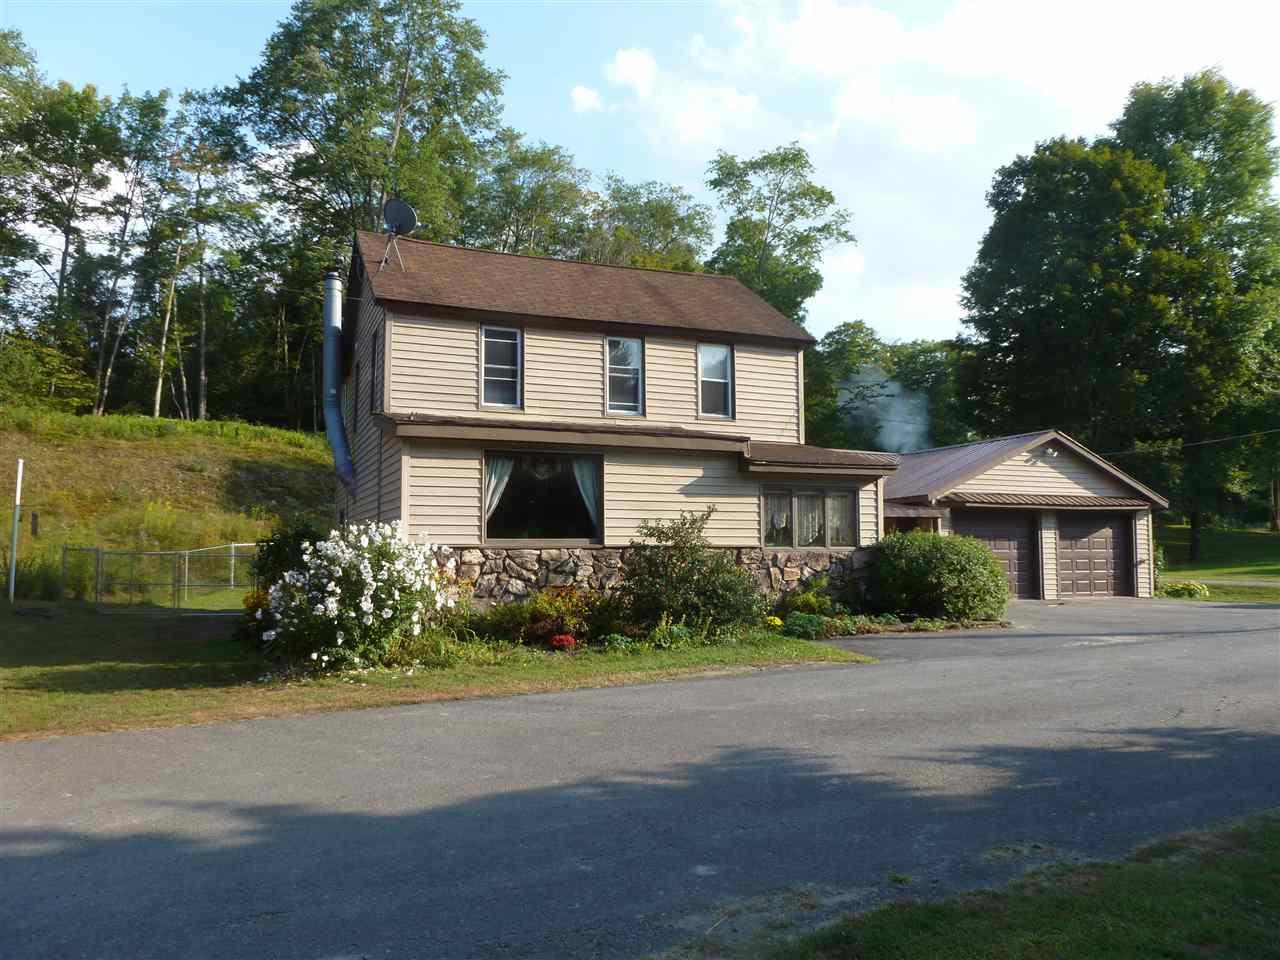 Real Estate for Sale, ListingId: 36474049, Livingston Manor,NY12758